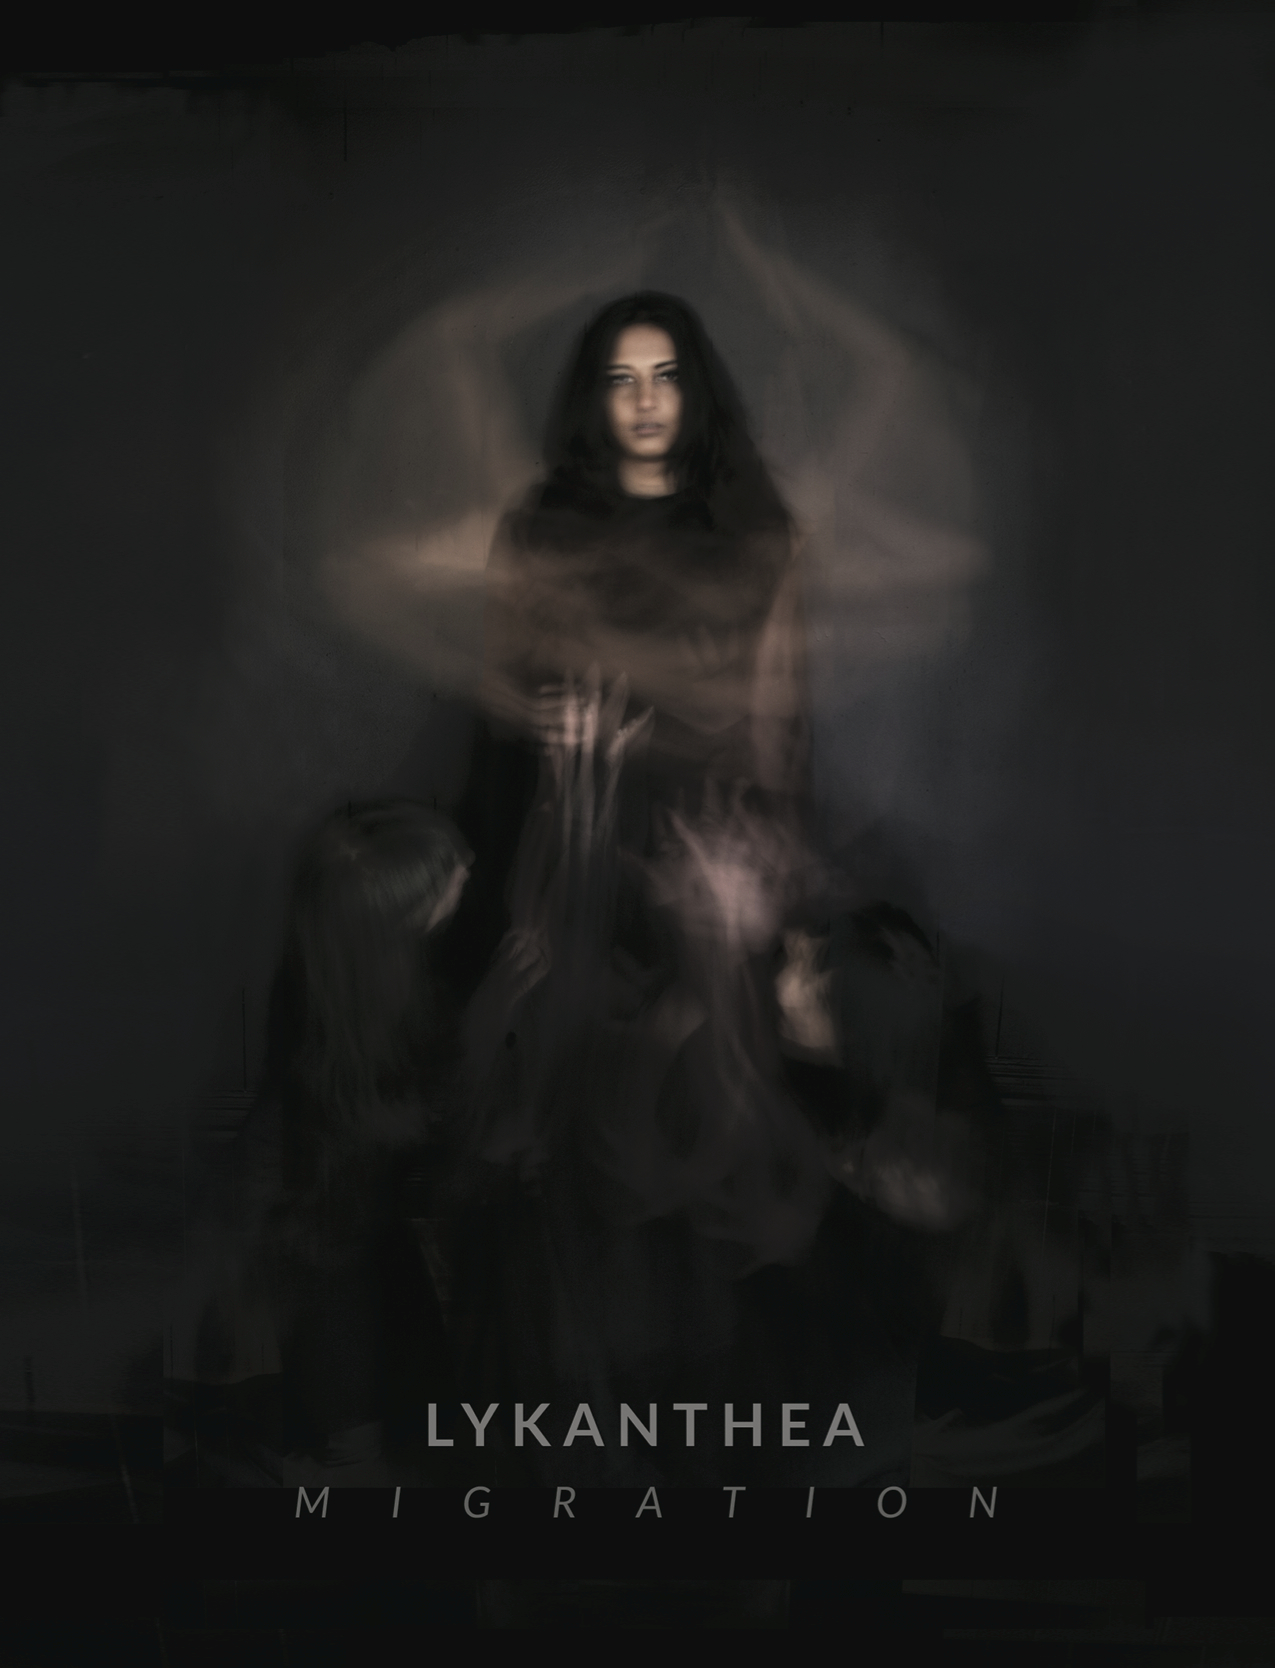 lykanthea_migration